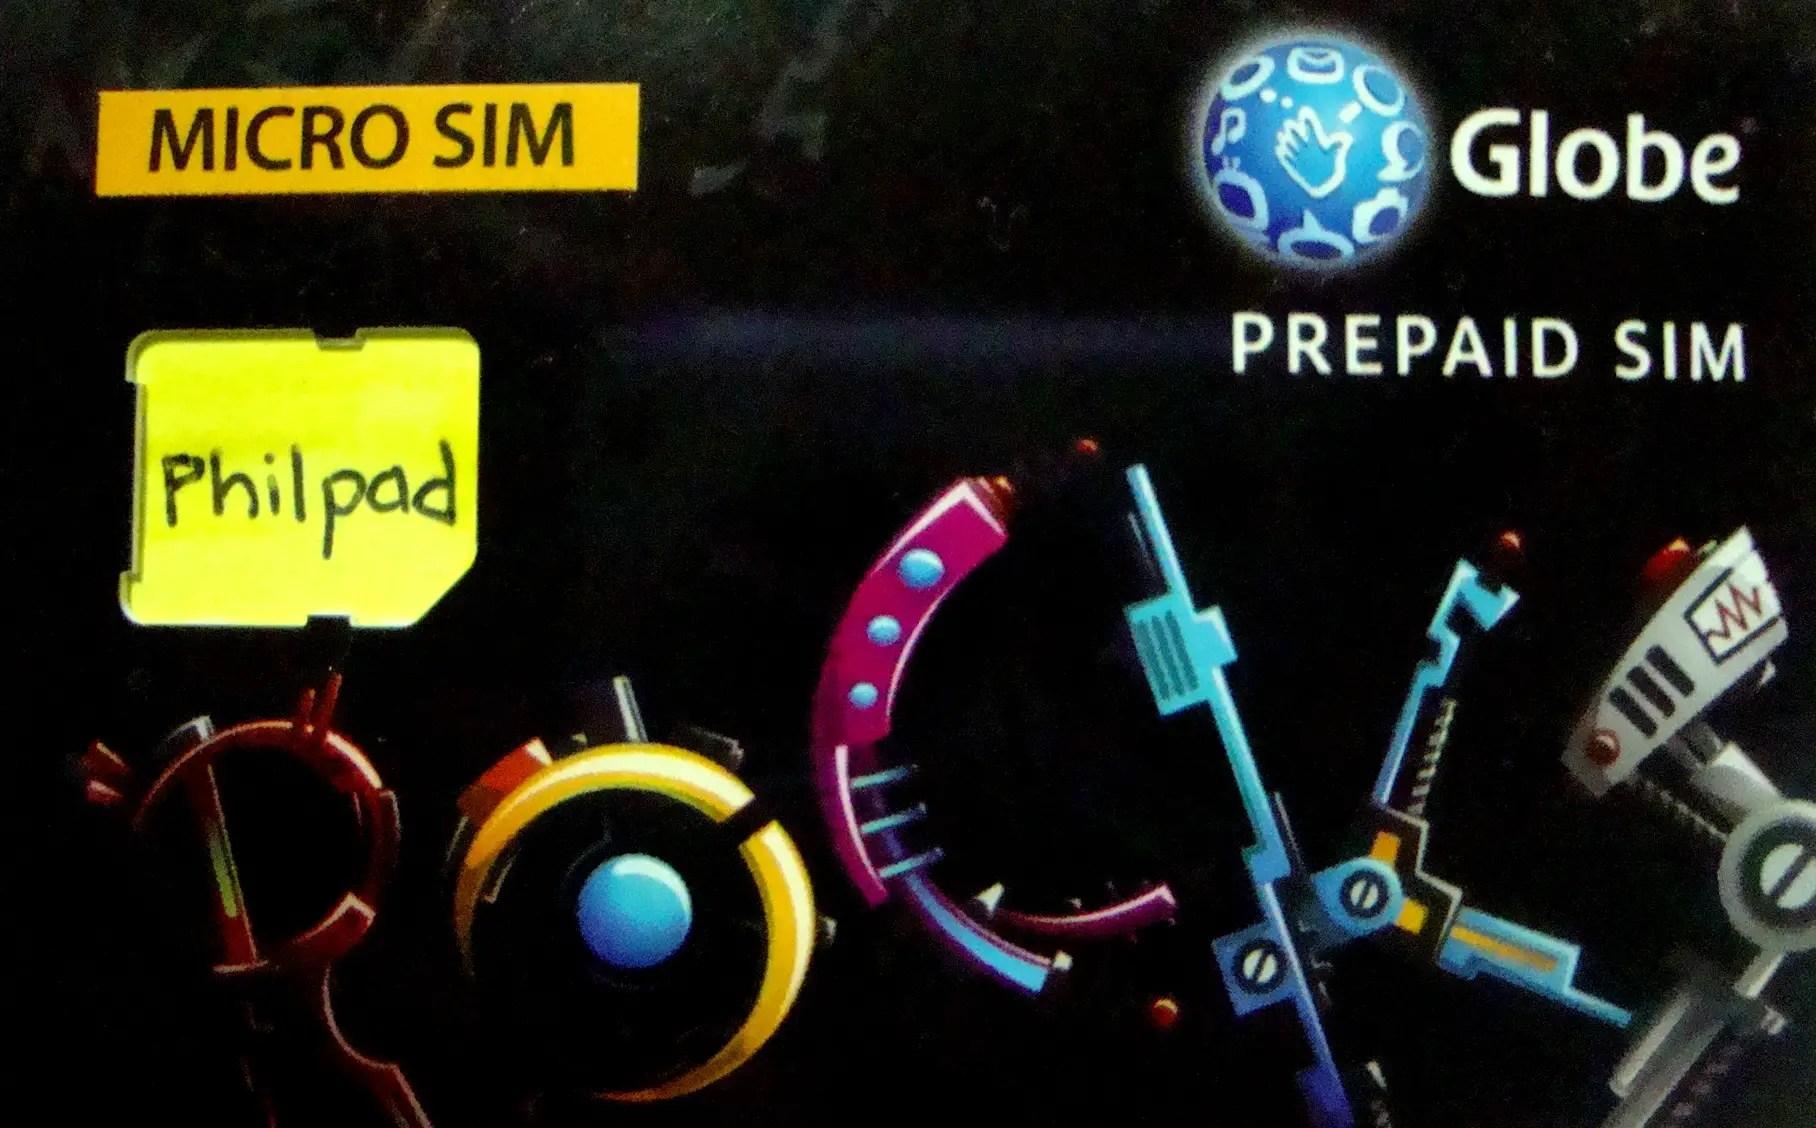 set up globe micro sim prepaid for iphone